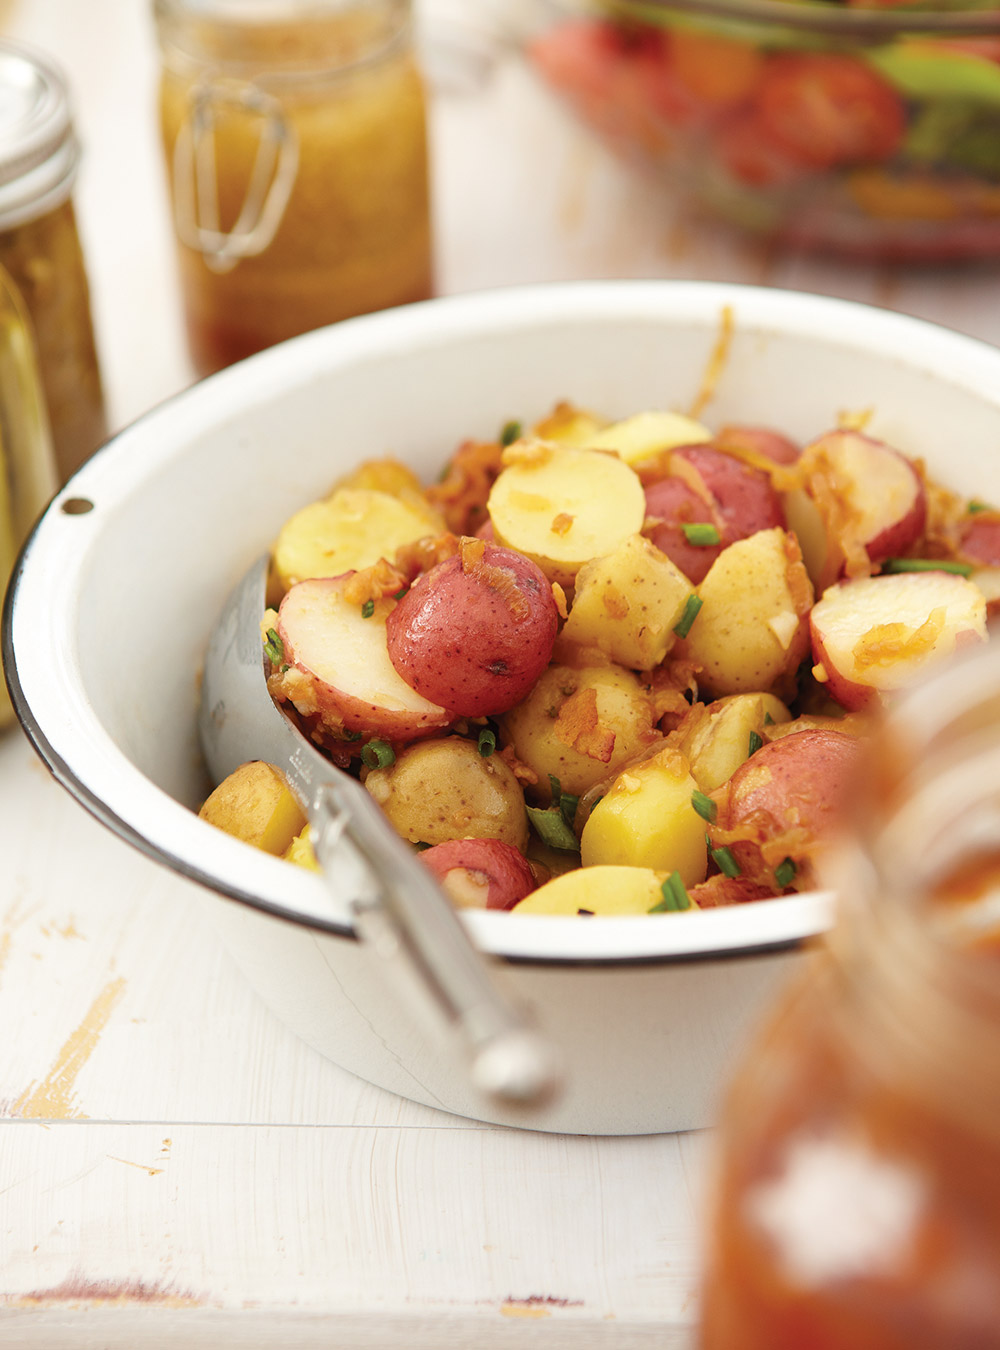 salade de pommes de terre au bacon ricardo. Black Bedroom Furniture Sets. Home Design Ideas